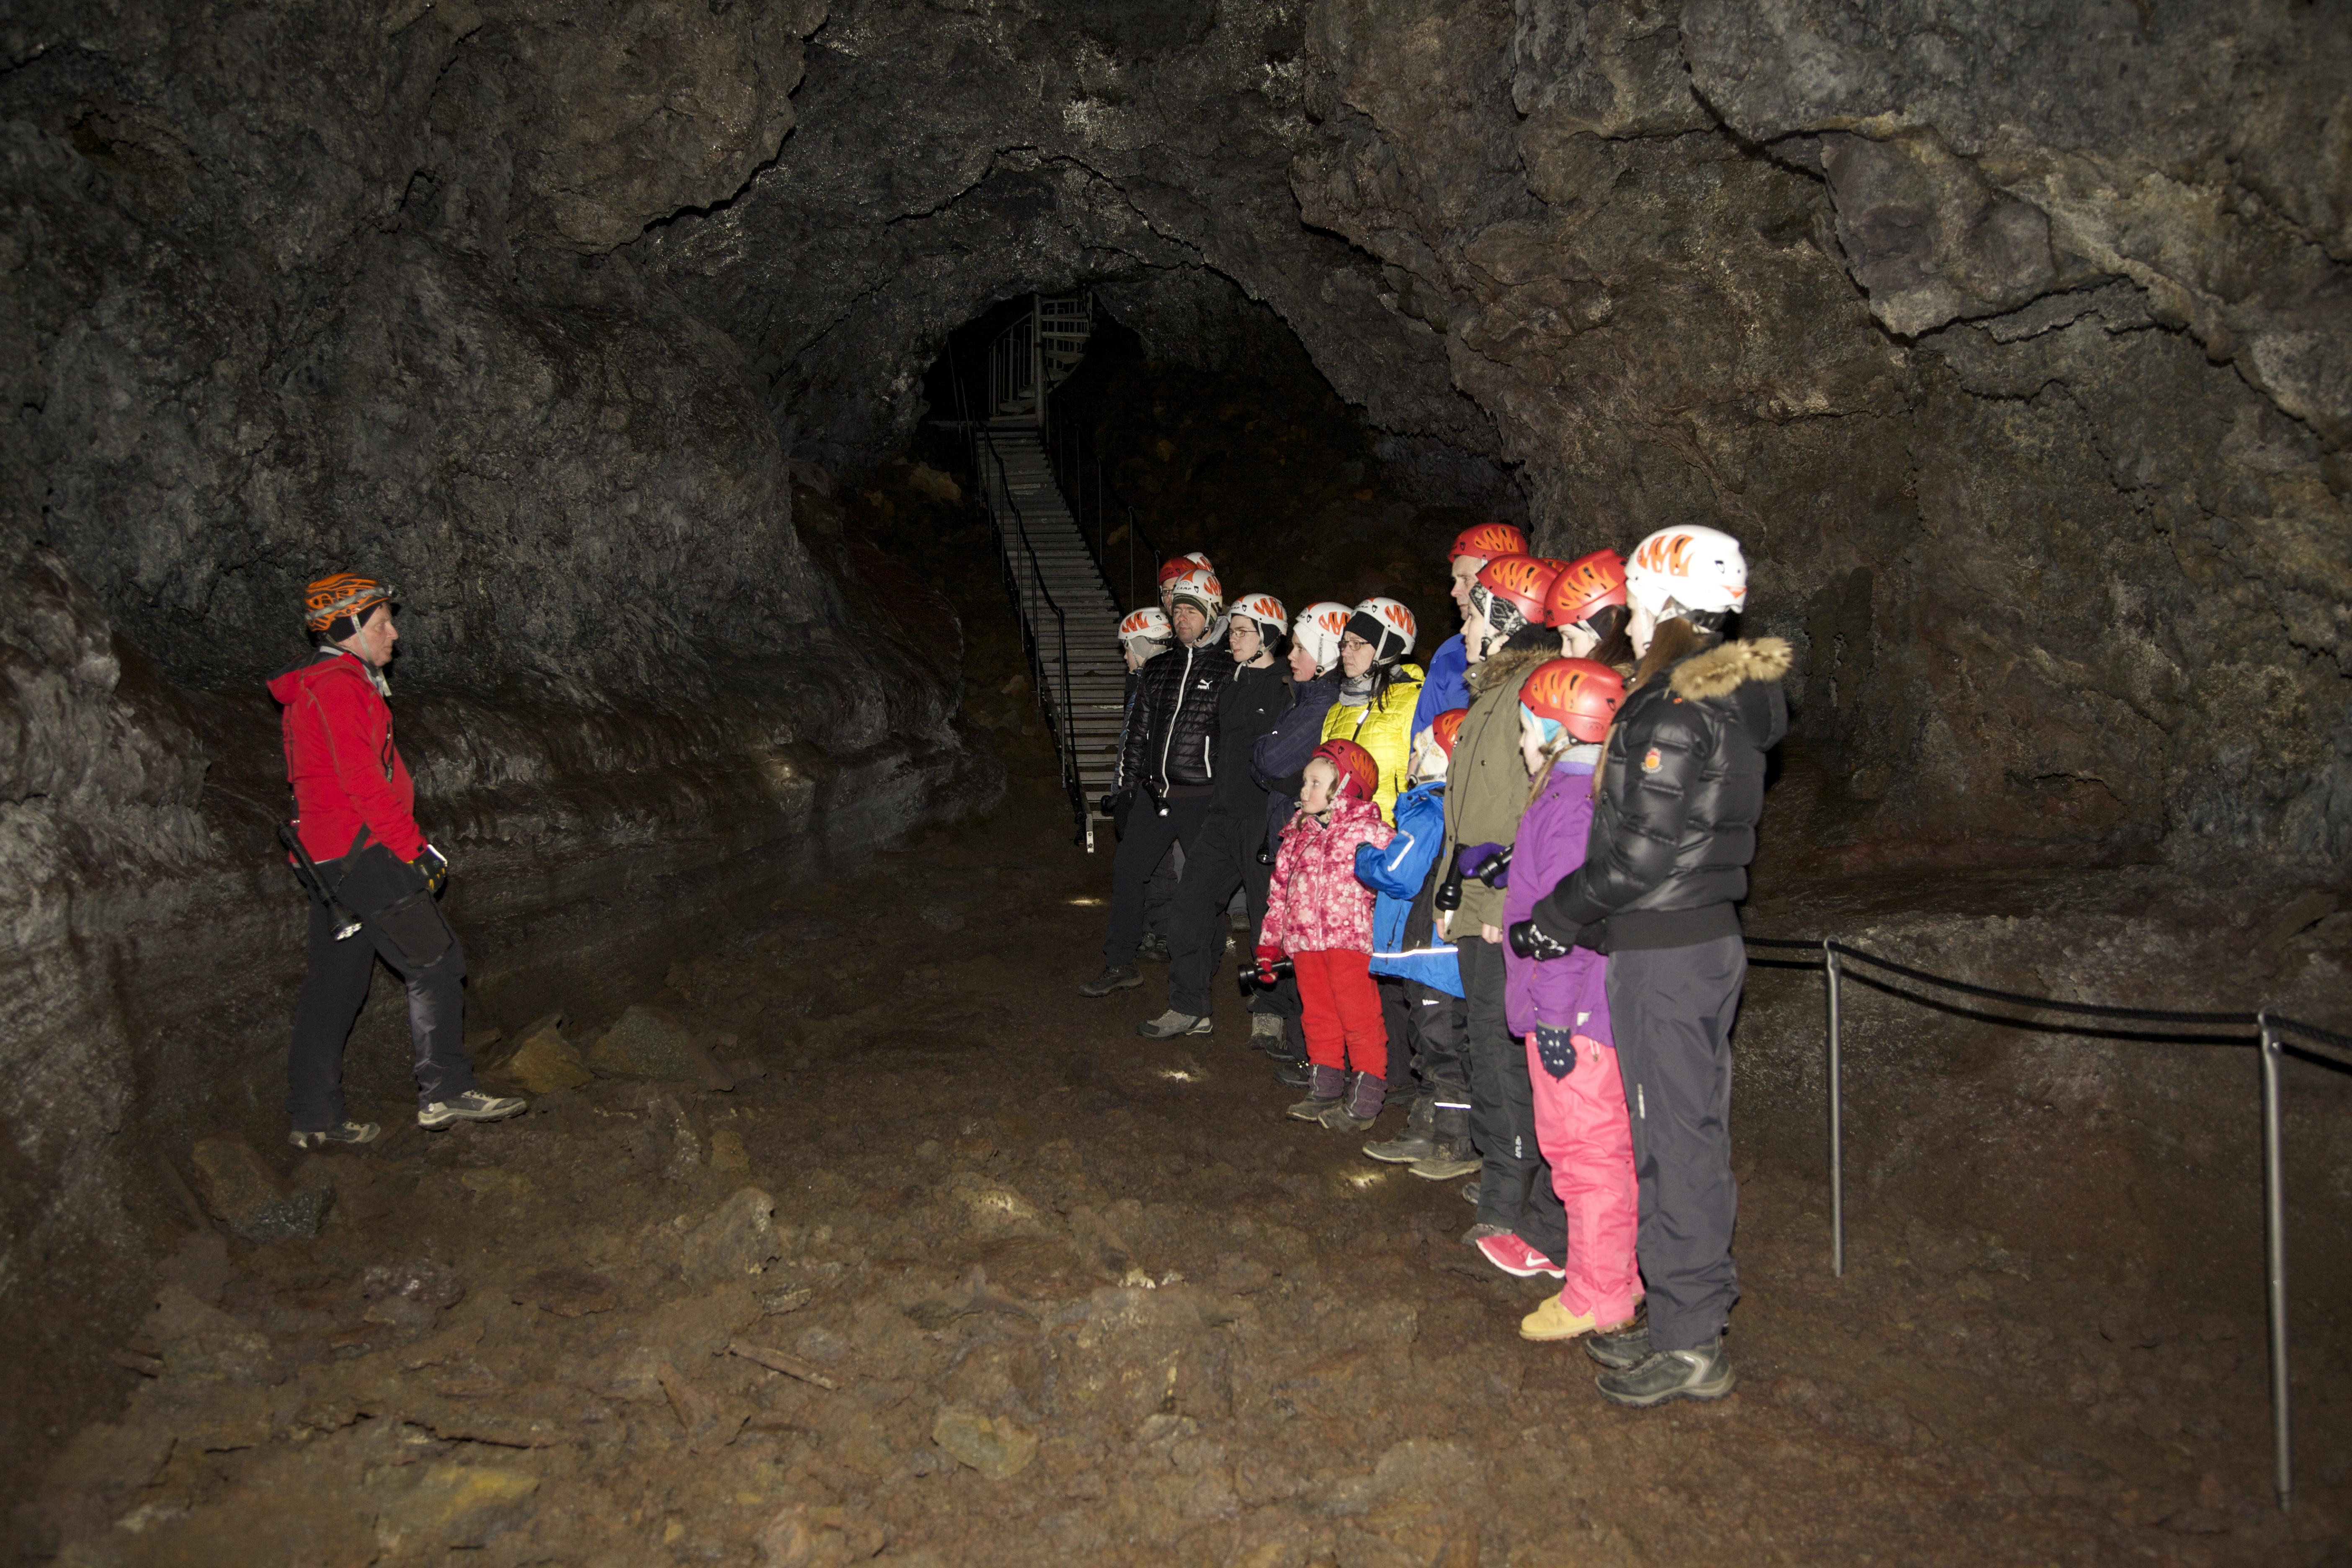 Vatnshellir is a 8,000-year-old lava cave on Iceland's Snæfellsnes Peninsula.